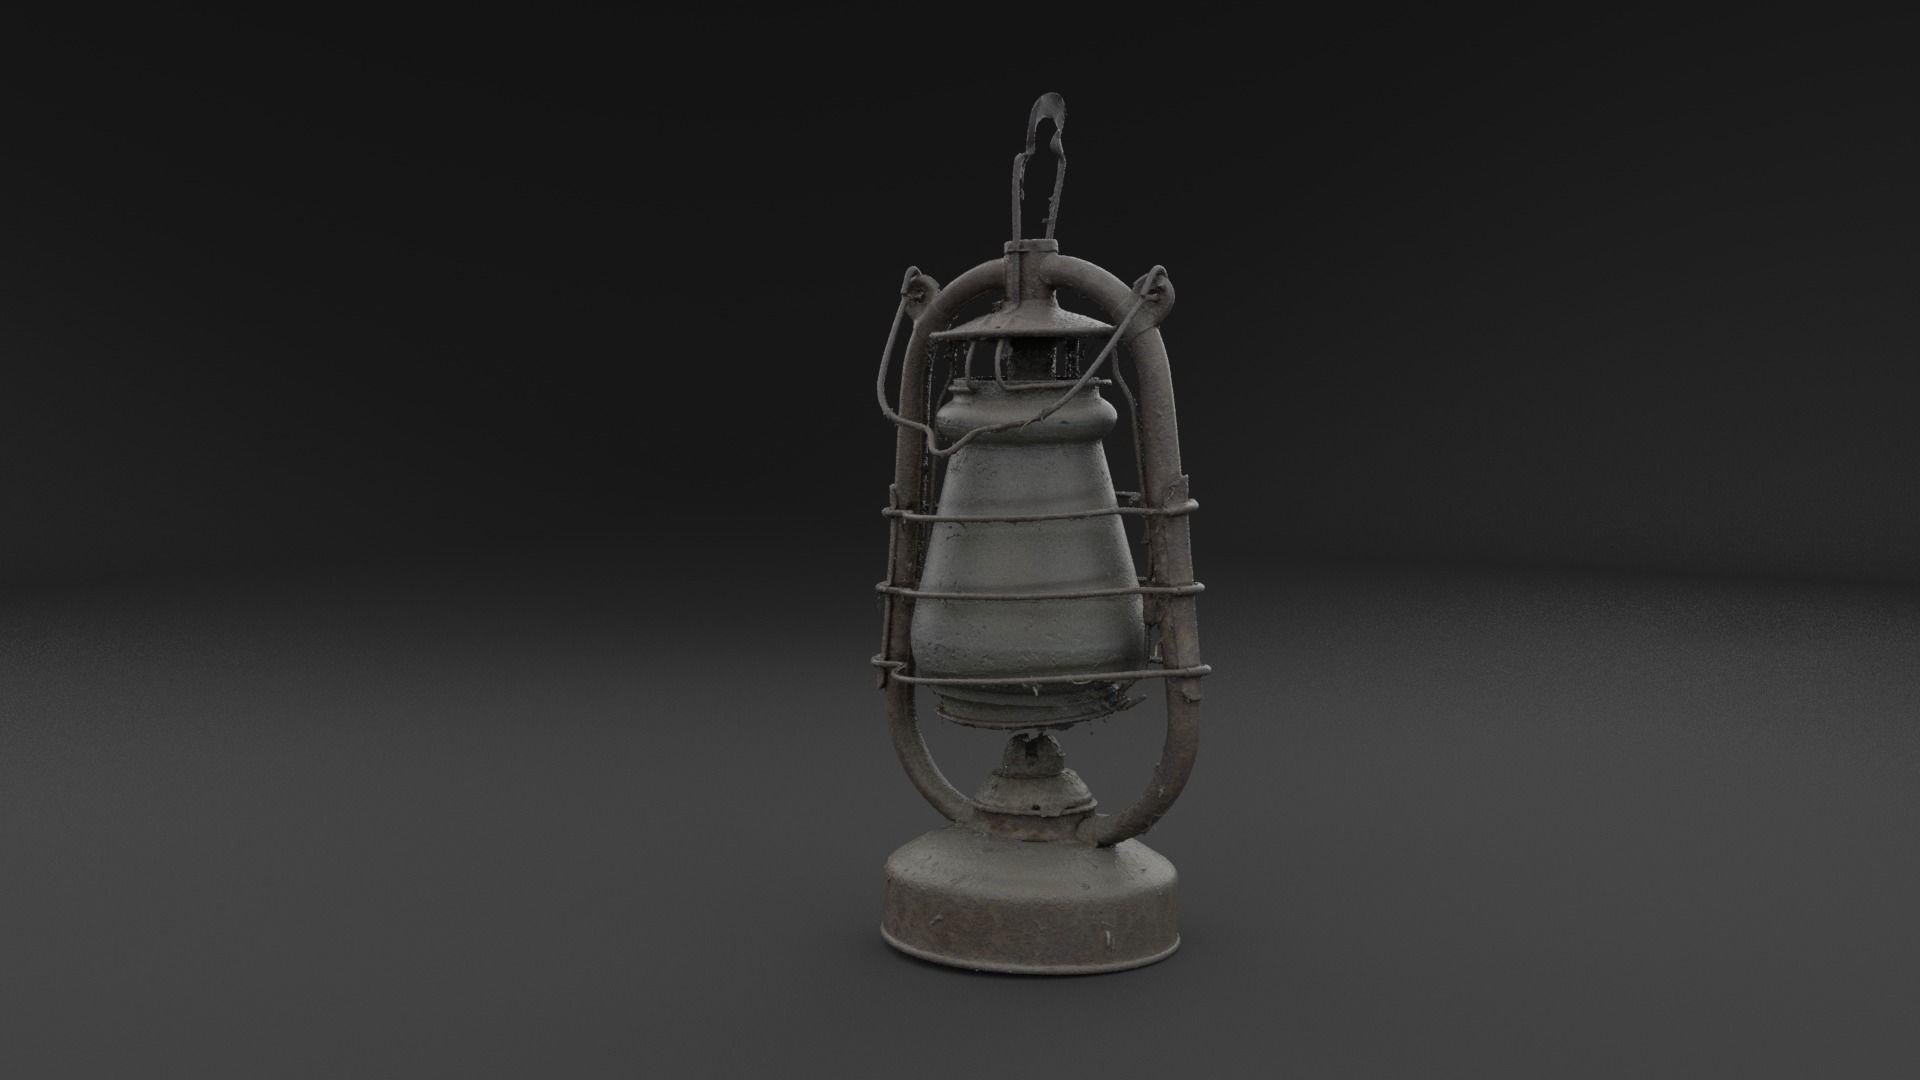 Scanned Old Kerosene Lamp RAW SCAN